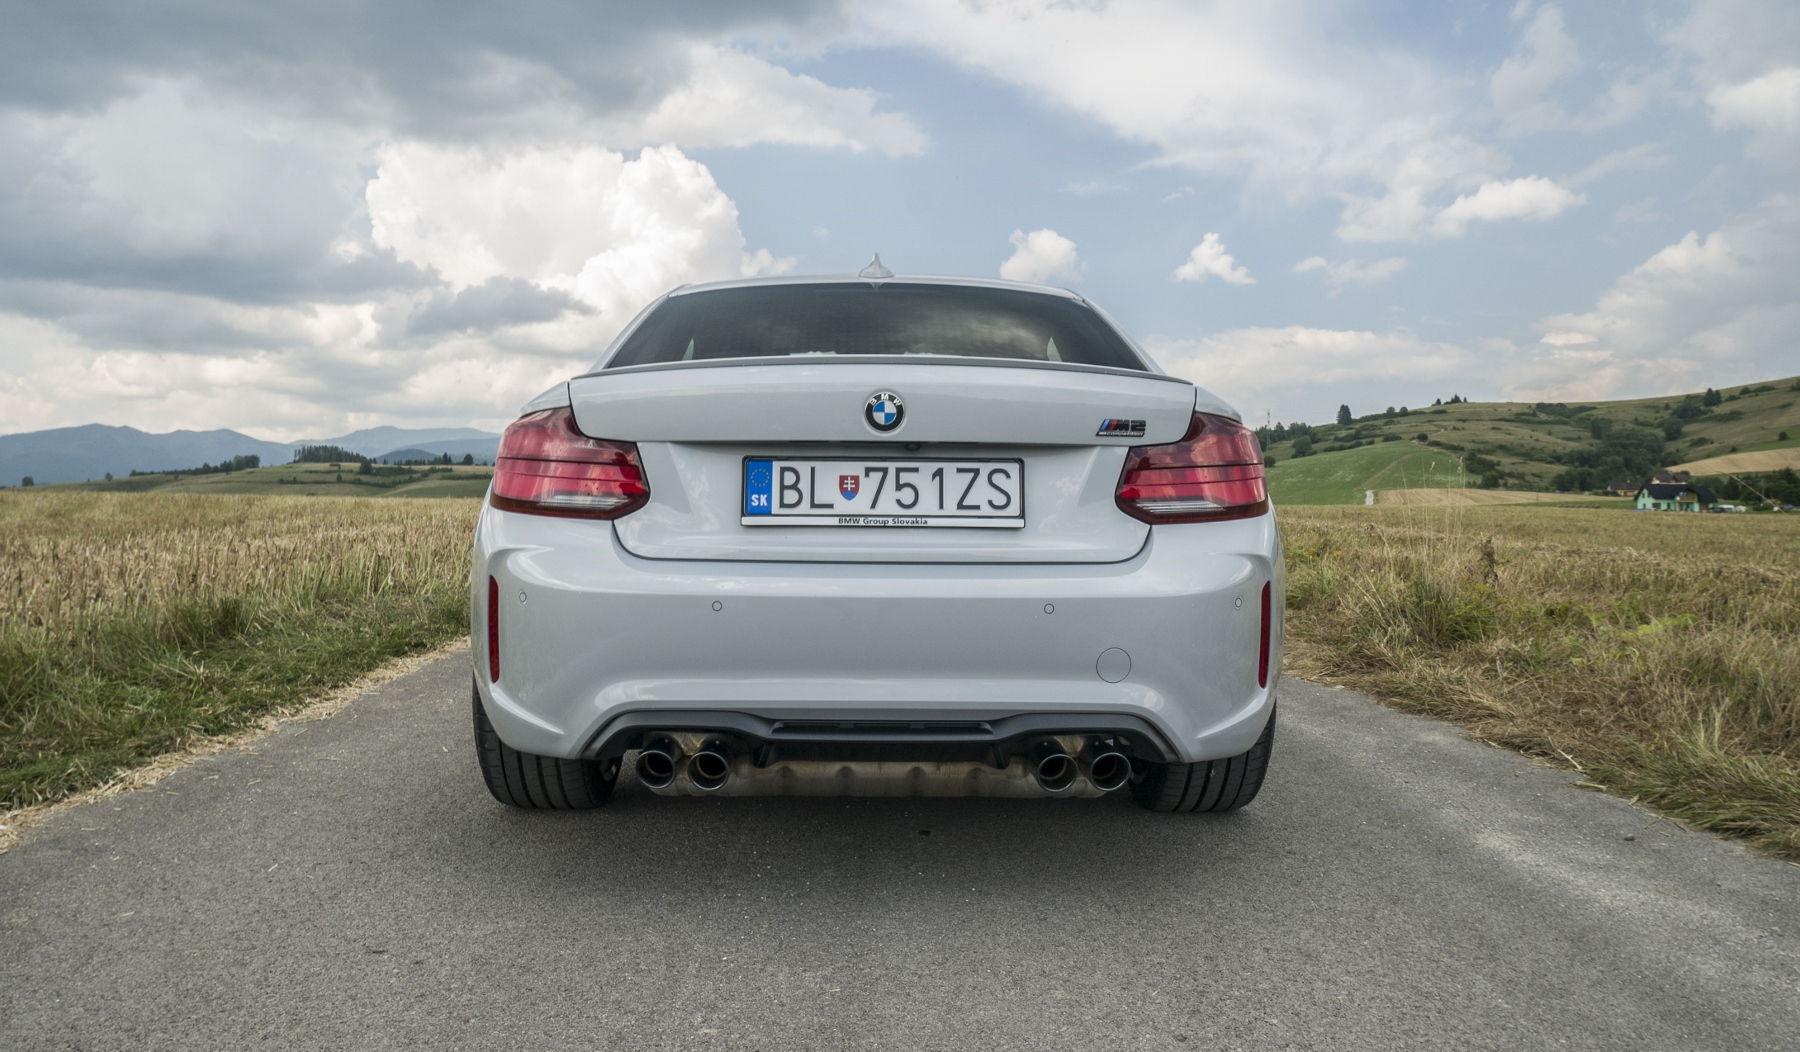 Test: BMW M2 Competition je nálož plná zábavy R7UdfZKKFK bmw-m2-4